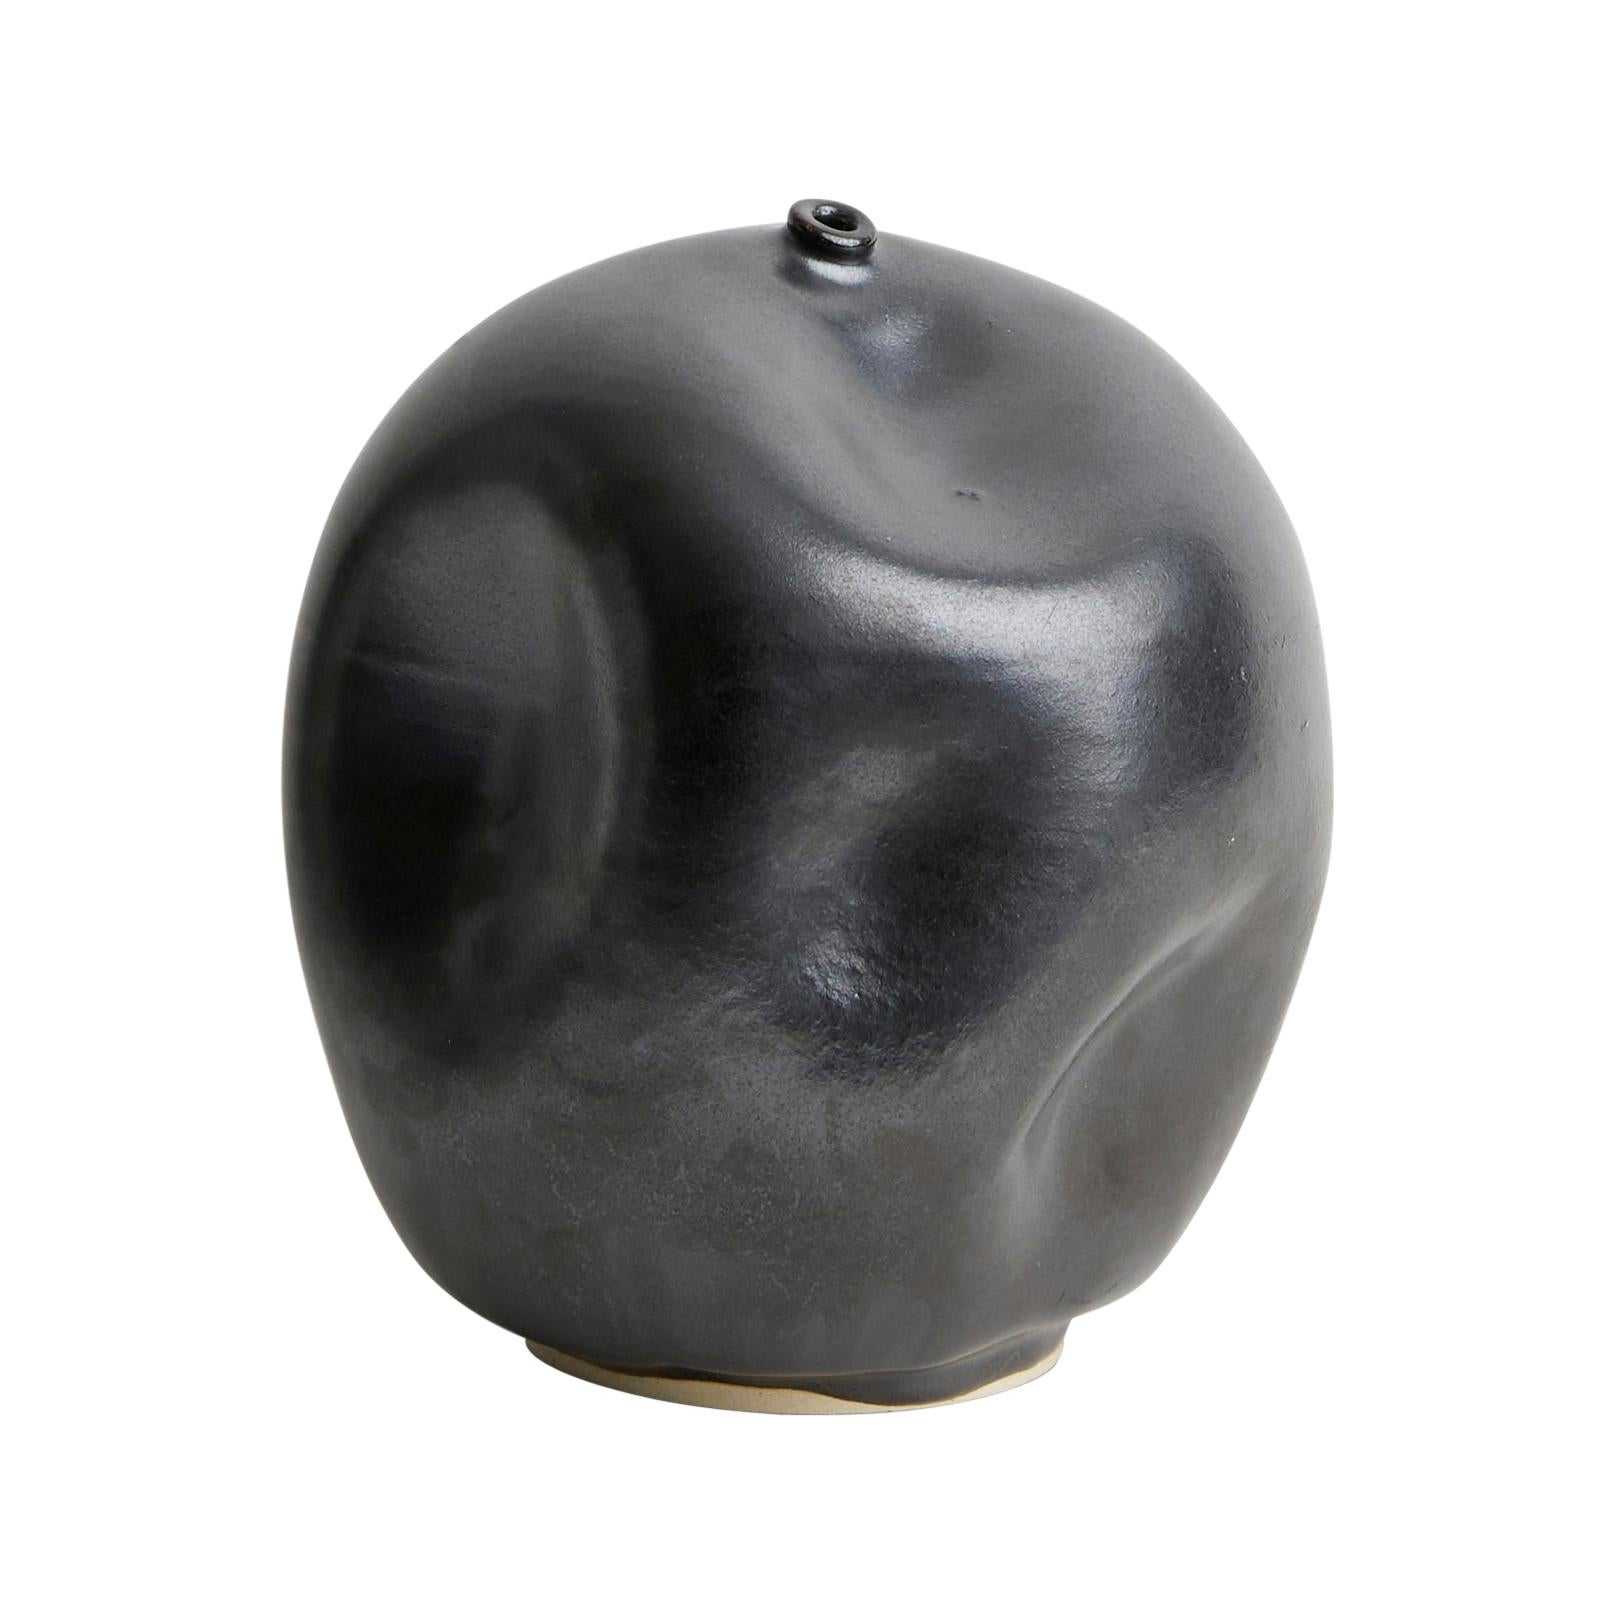 Skoby Joe Black Handmade Ceramic Vessel Wabi Sabi Mid-Century Modern Sculpture